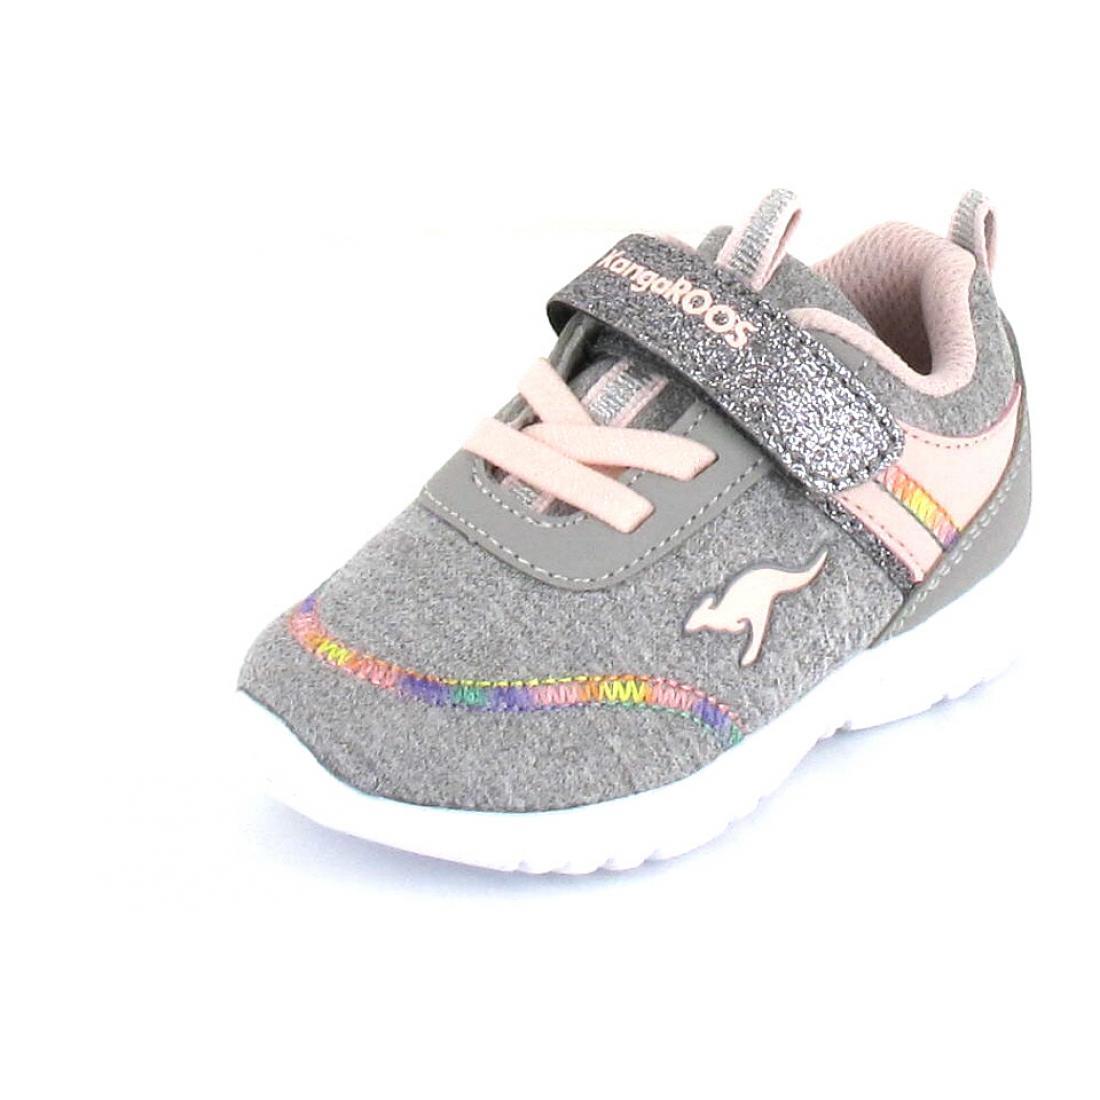 KangaRoos Sneaker KY-Chummy EV